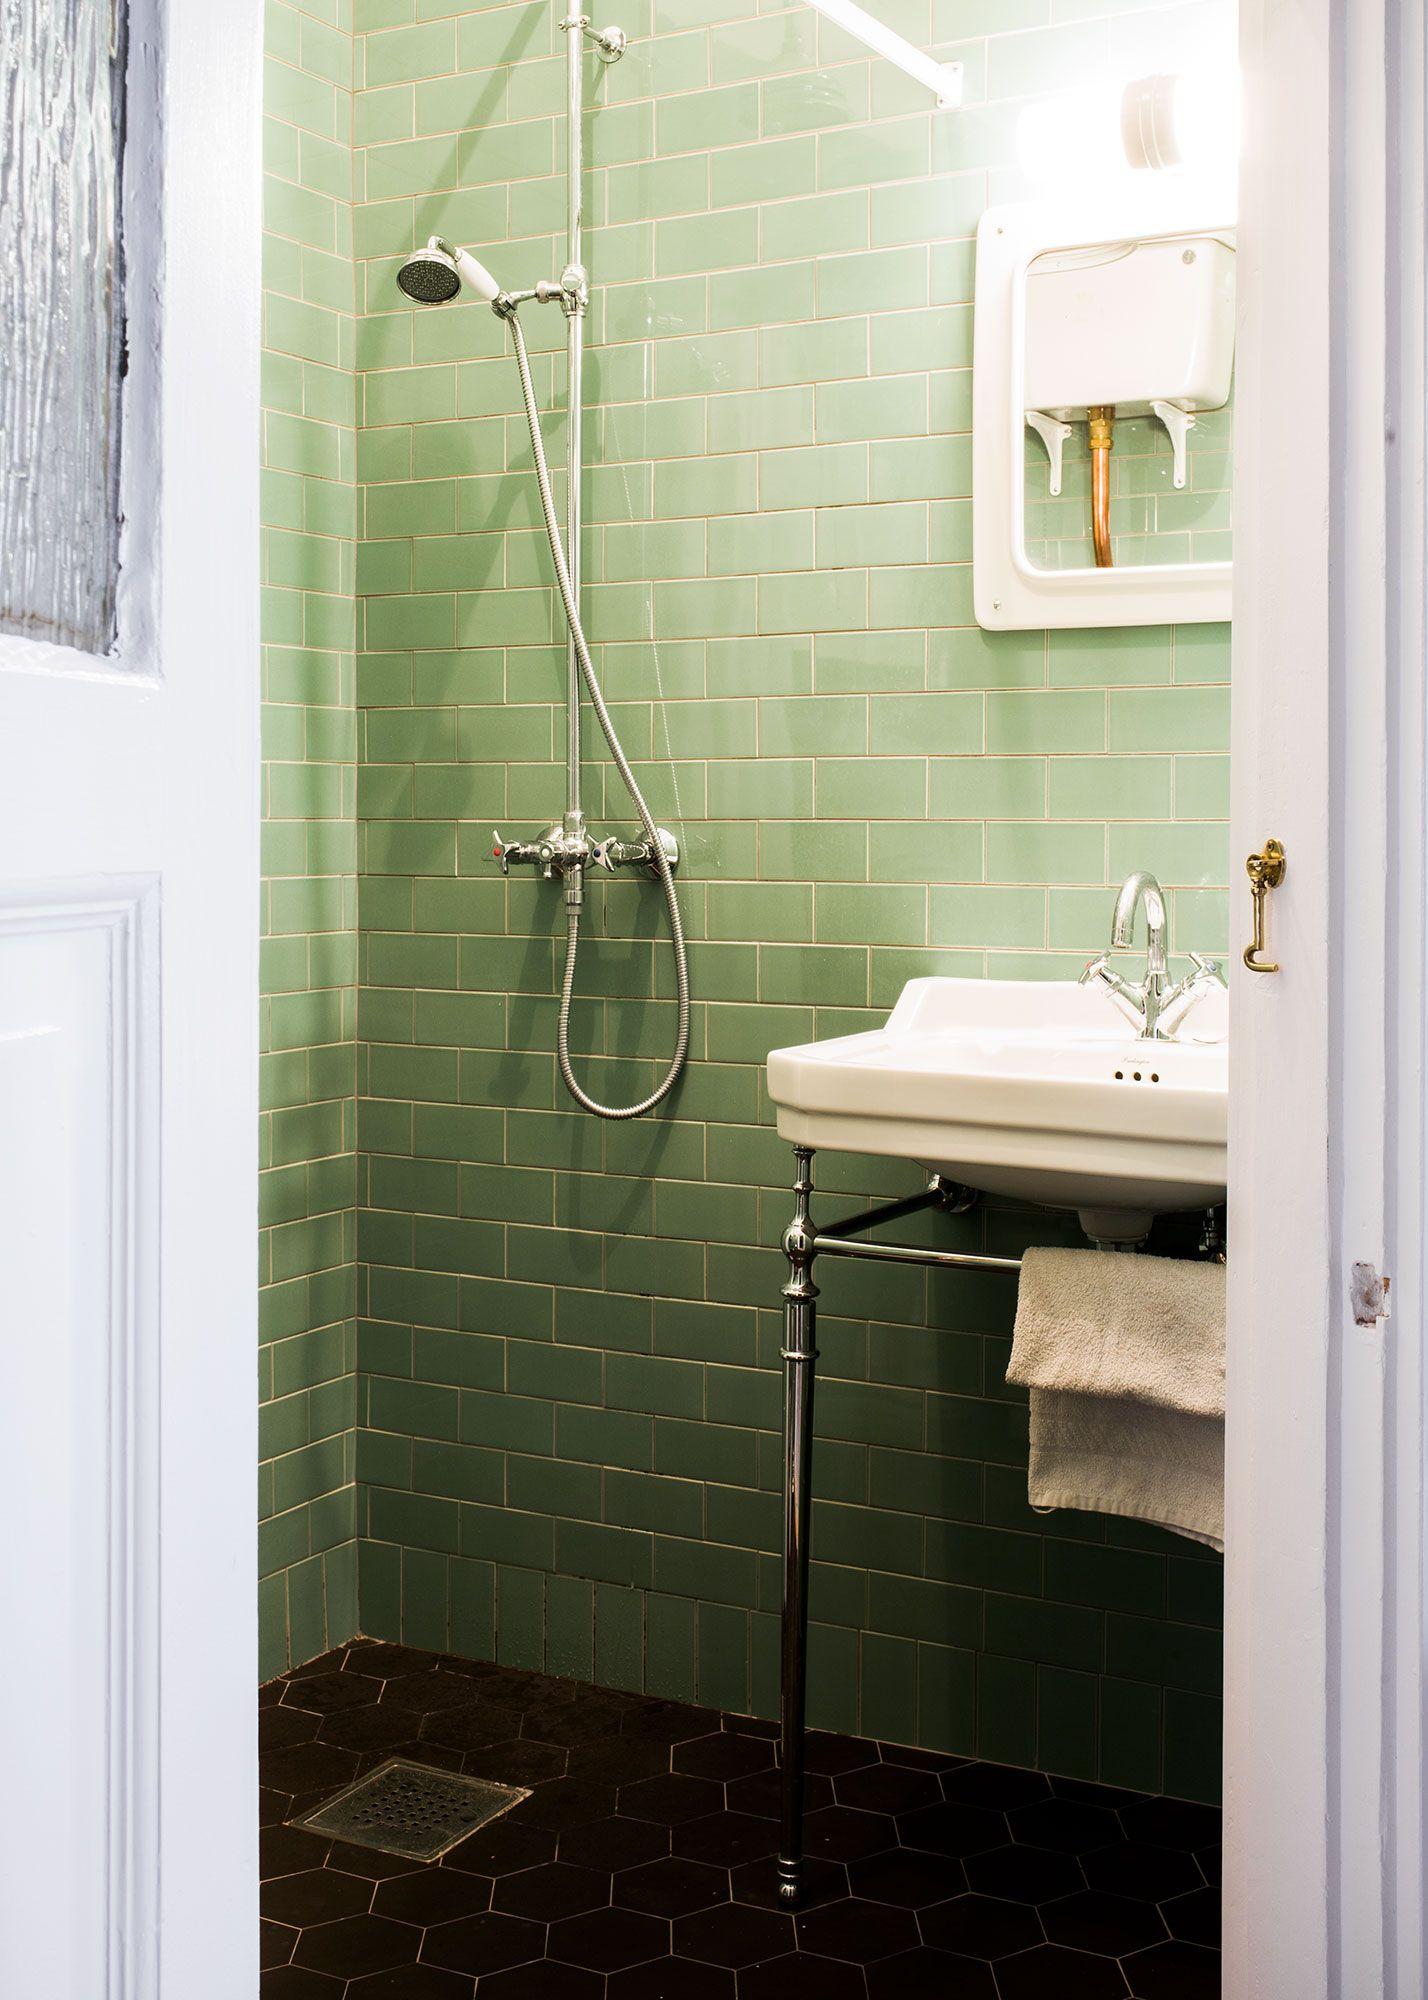 Litet badrum med grönt kakel Inspiration Byggfabriken u2013 modern byggnadsvård bathrooms i